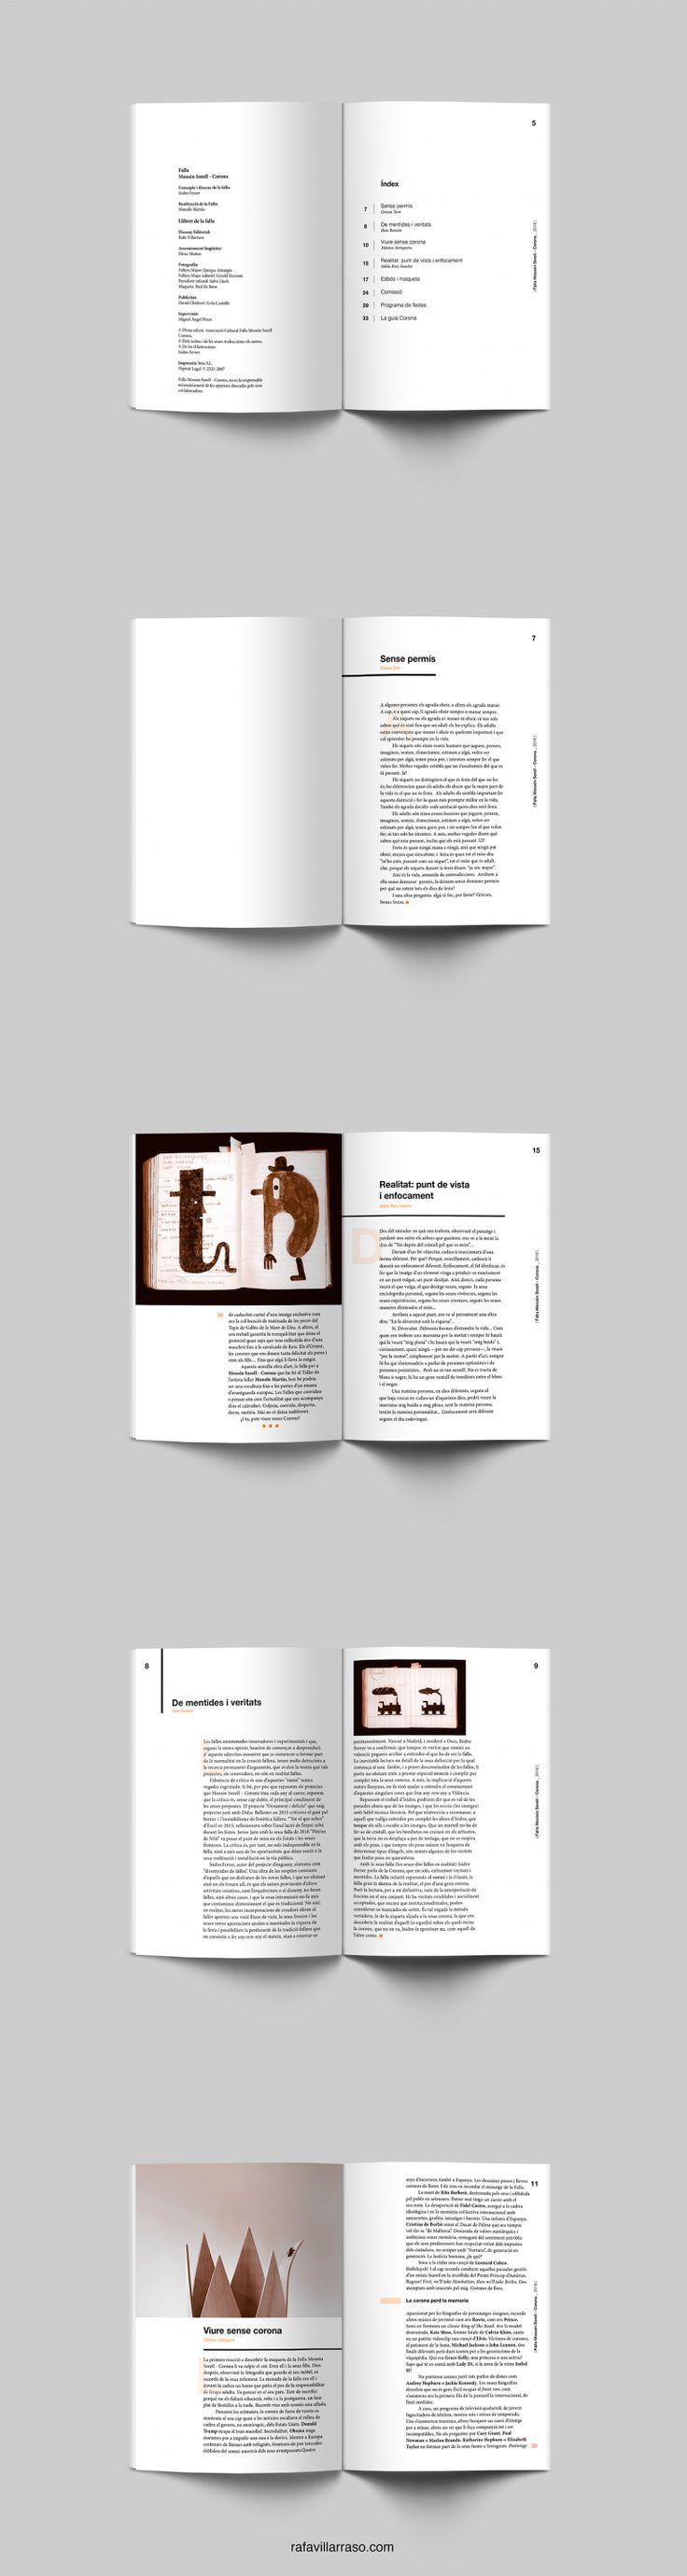 Mejores 87 imágenes de Magazine & book design en Pinterest   Diseño ...